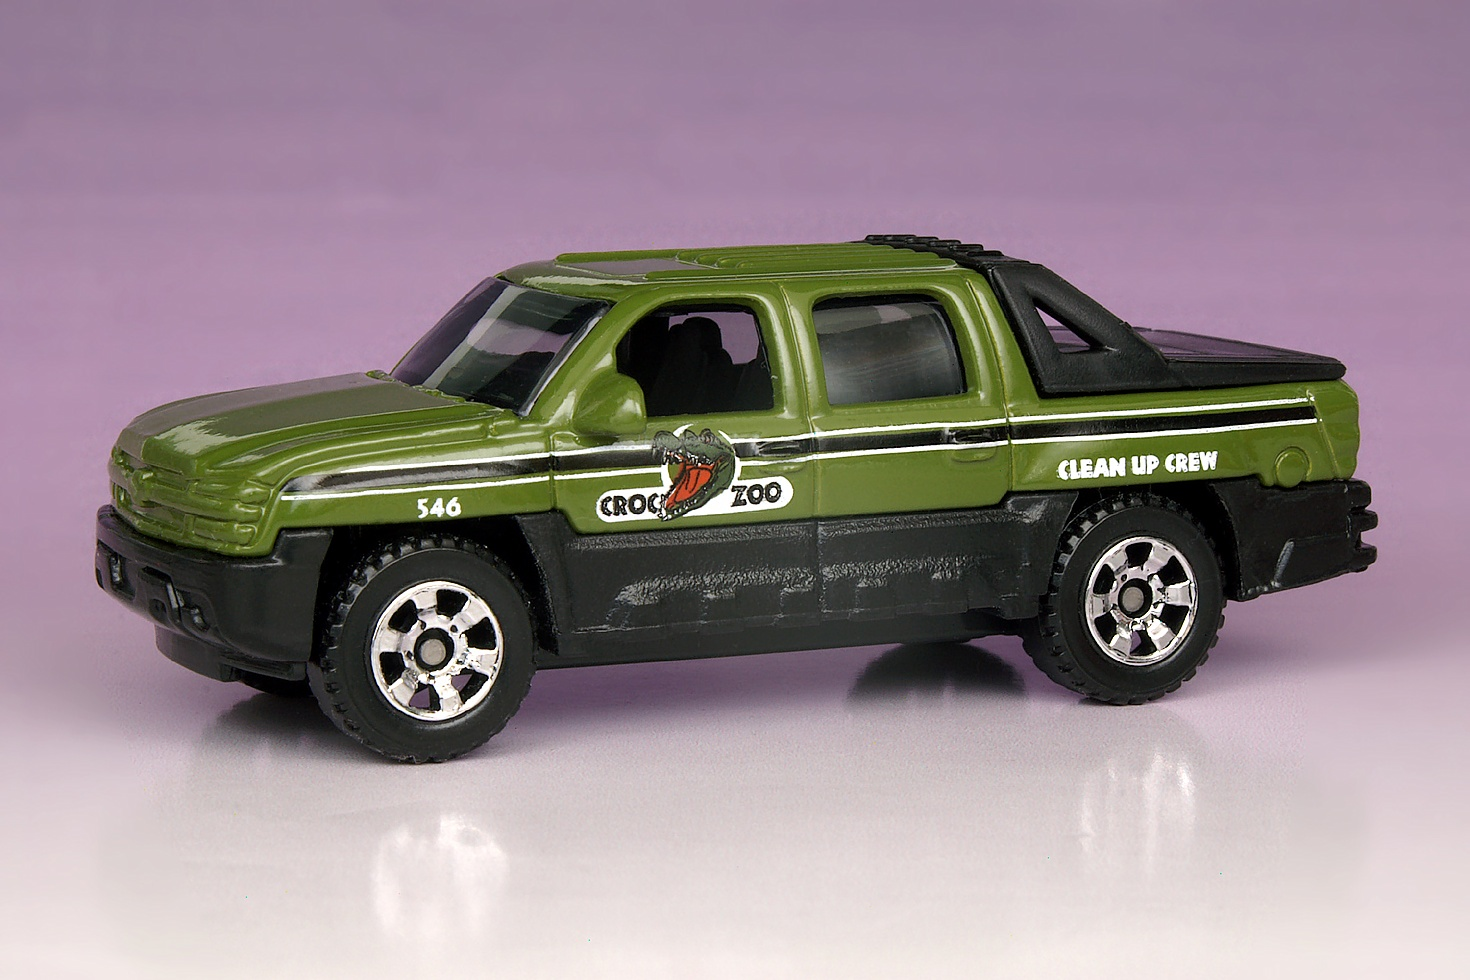 Matchbox Chevy Truck Chevrolet Matchbox Free Engine